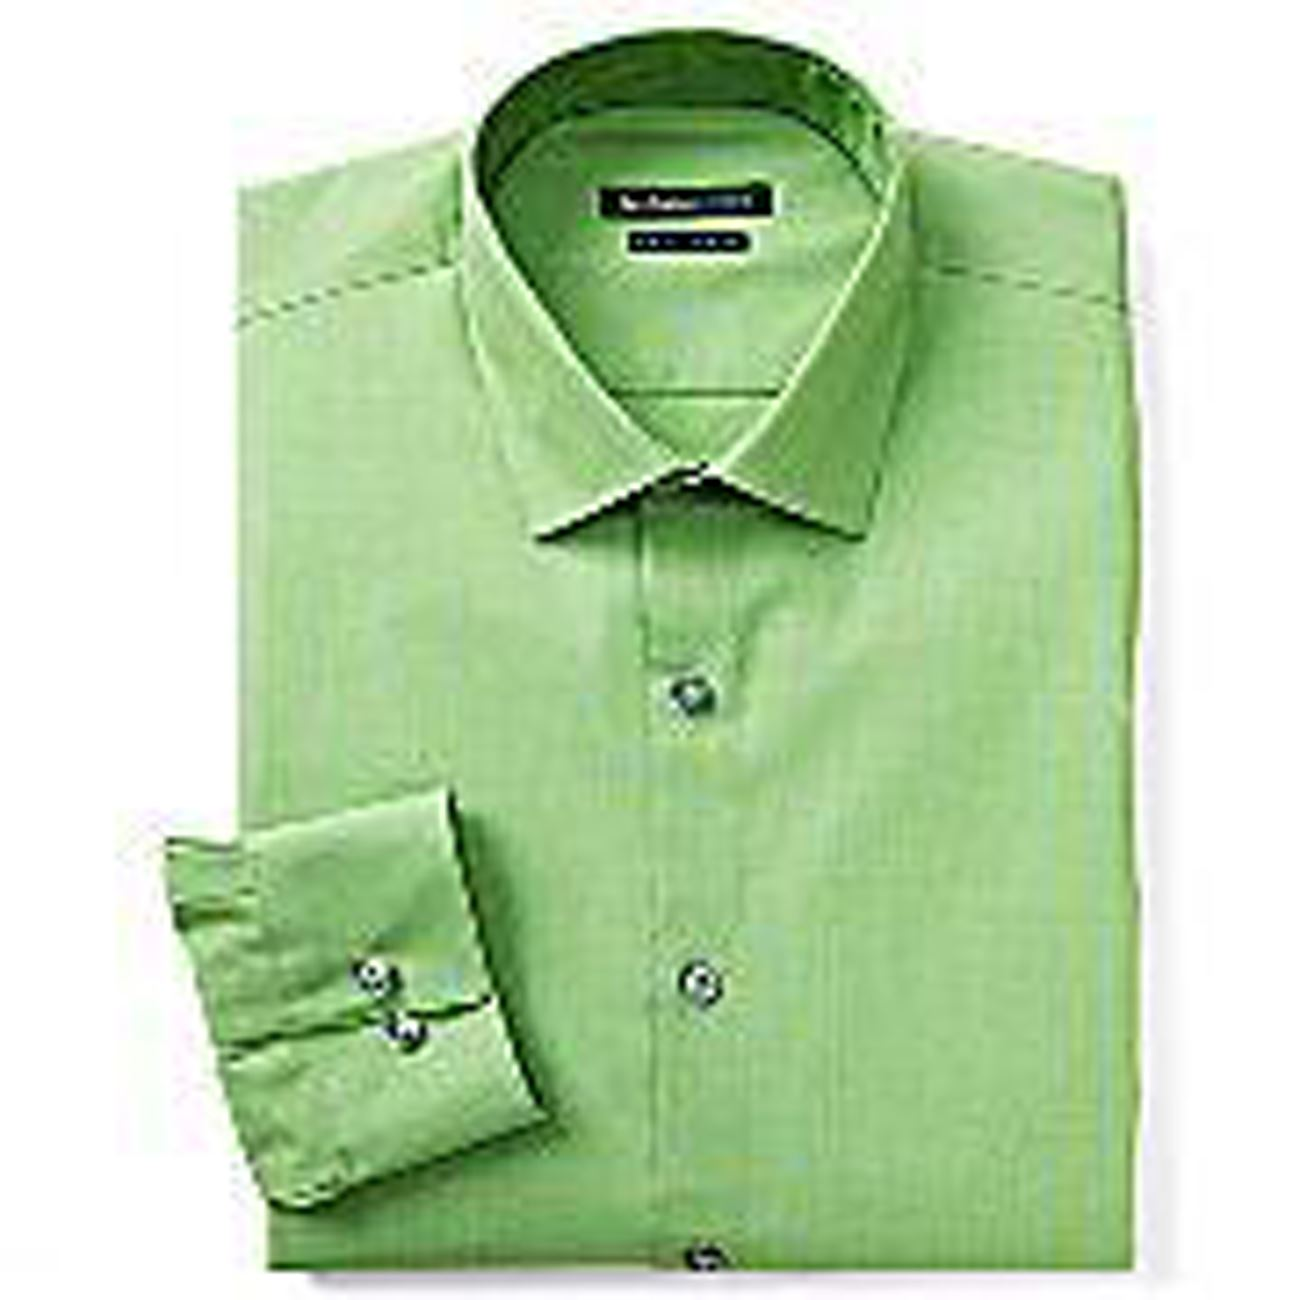 Mens shirt van heusen slim fit cotton rich easycare solid for Van heusen men s regular fit pincord dress shirt